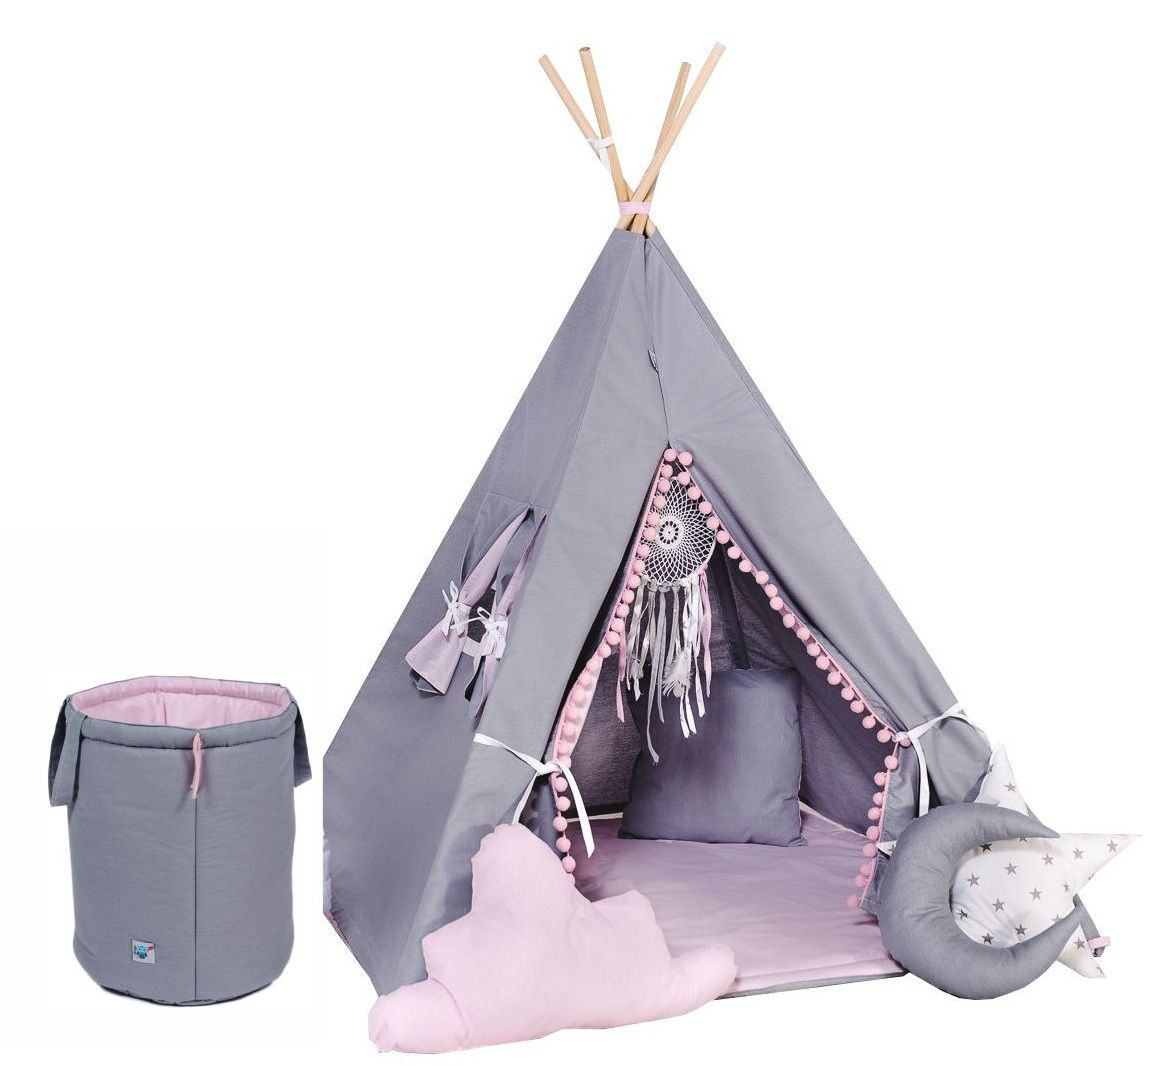 Namiot Tipi Wigwam Wielki Zestaw 11 Elementow 7121729679 Oficjalne Archiwum Allegro Toddler Bed Decor Hanging Chair